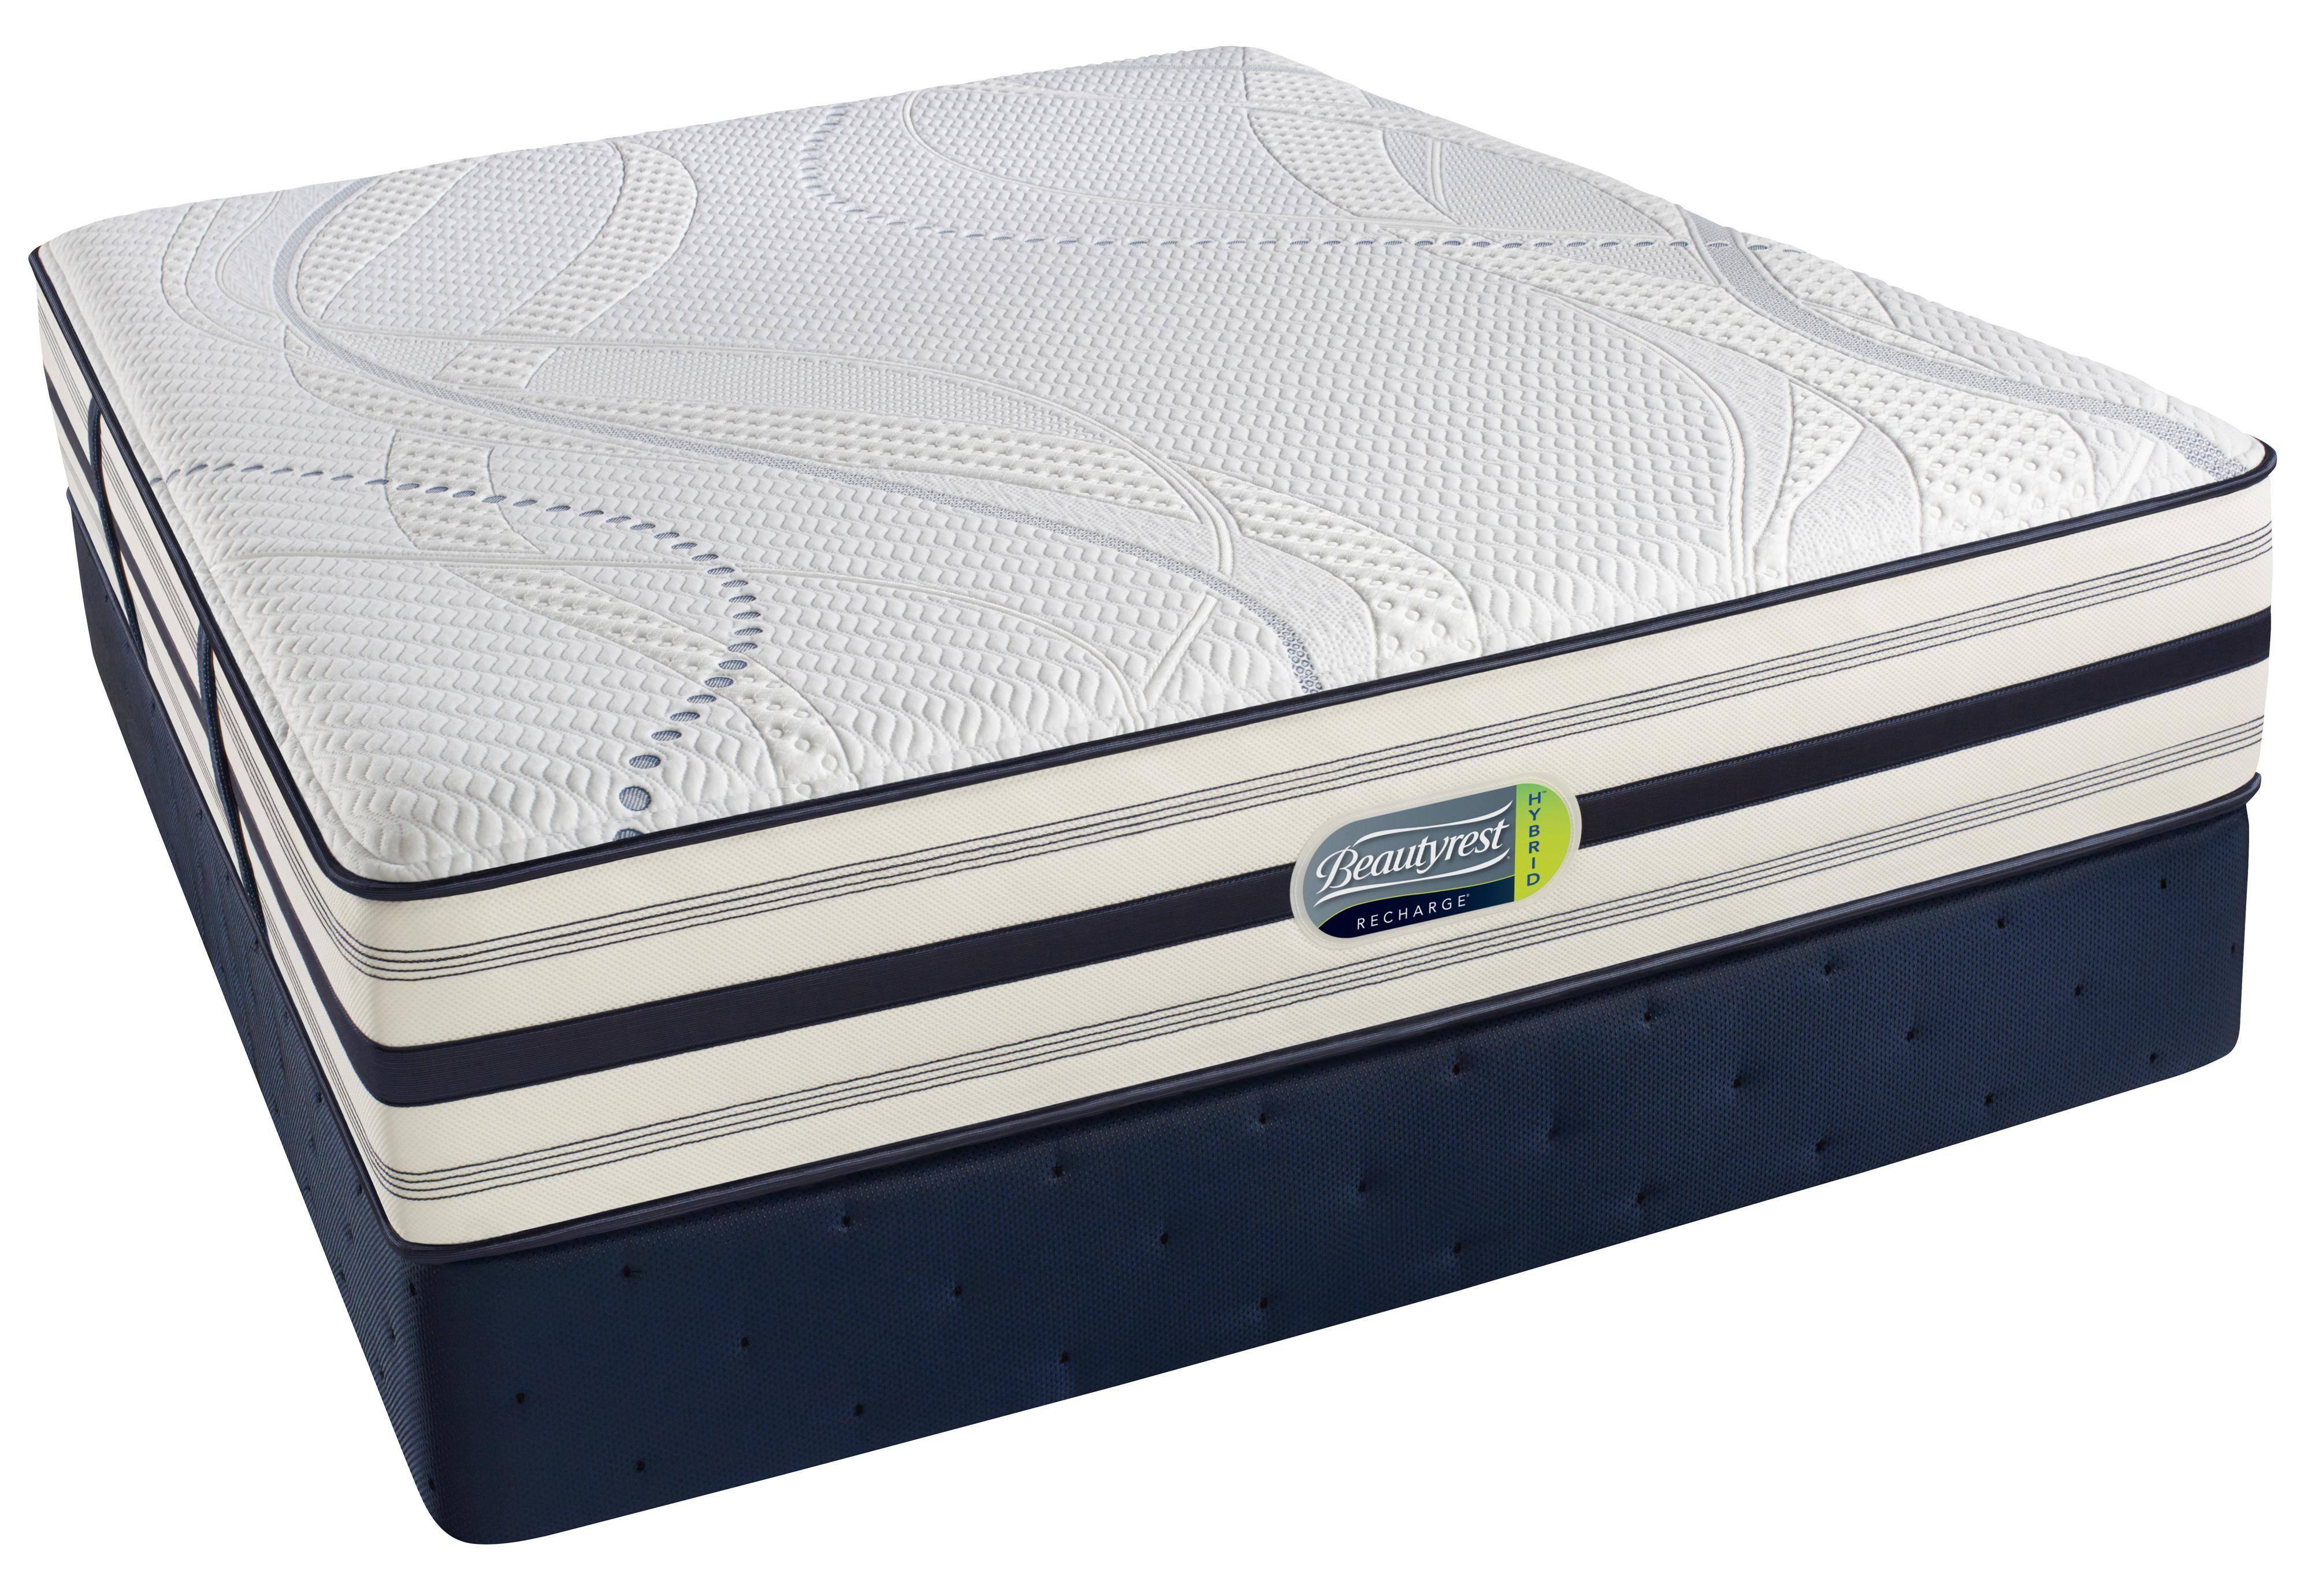 simmons beautyrest penelope ultimate plush evenloft twin xl mattress set recharge hybrid